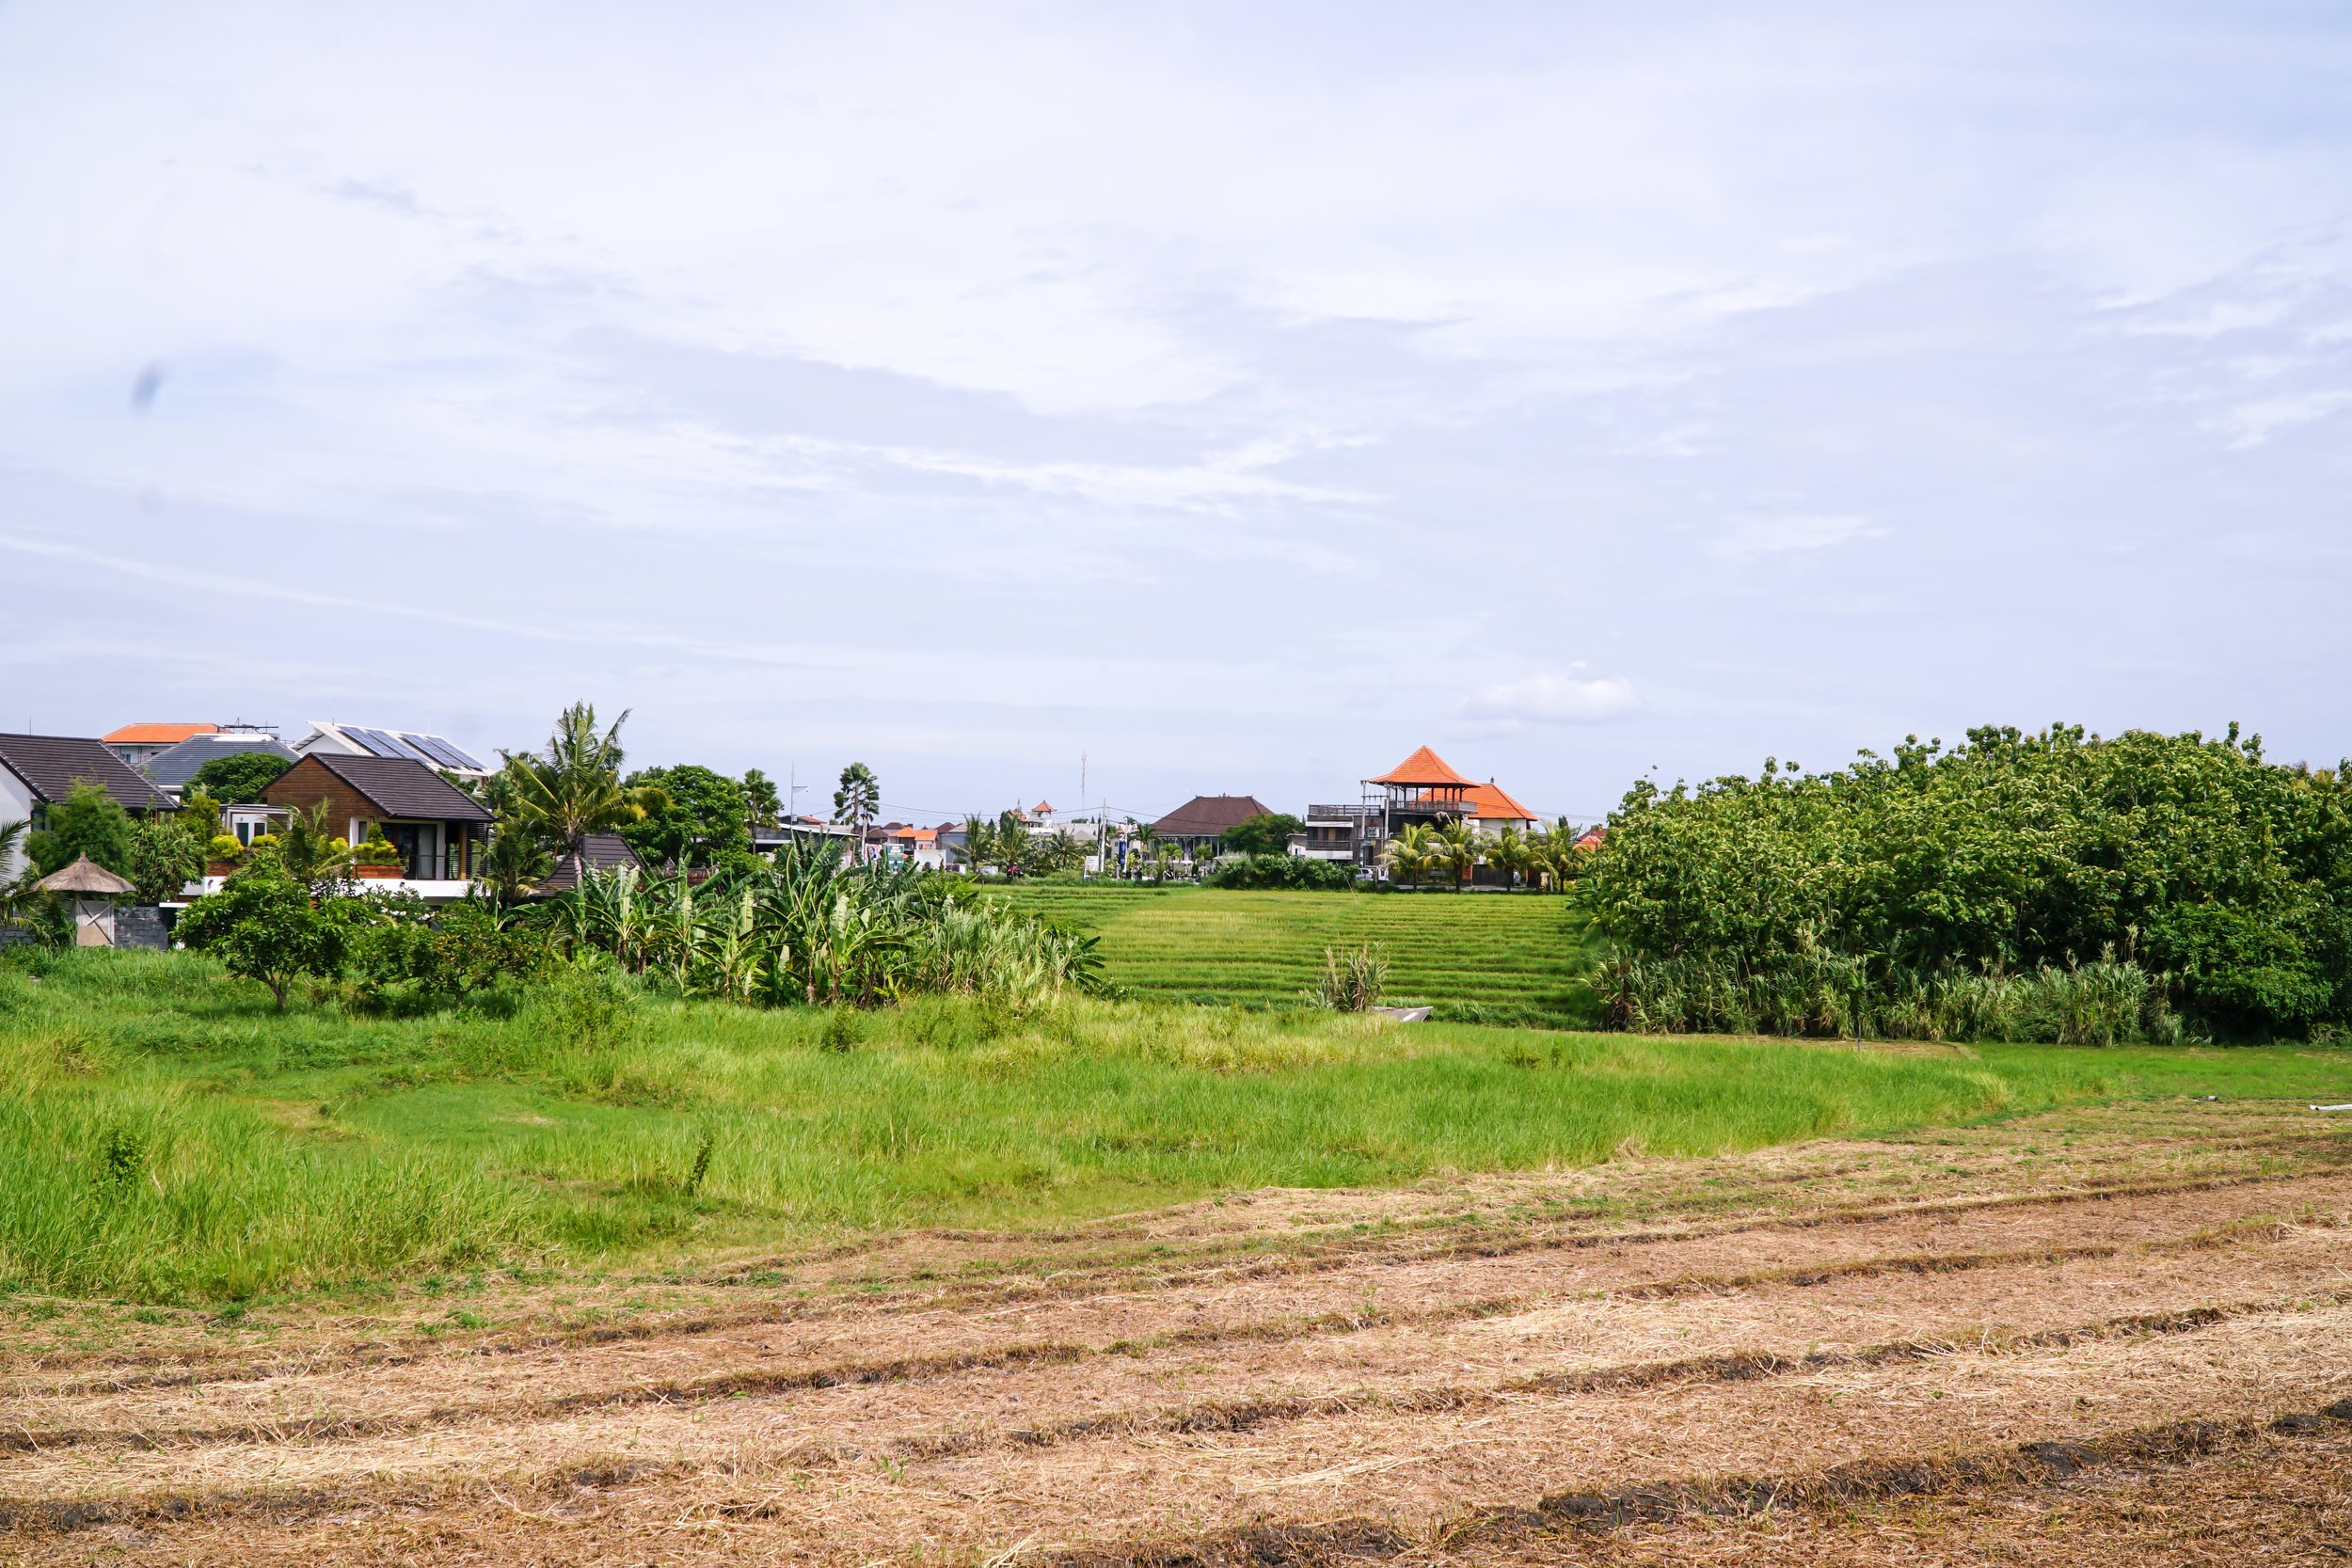 Happytrails.fi Bali Ubud Olkinuora-Valkonen